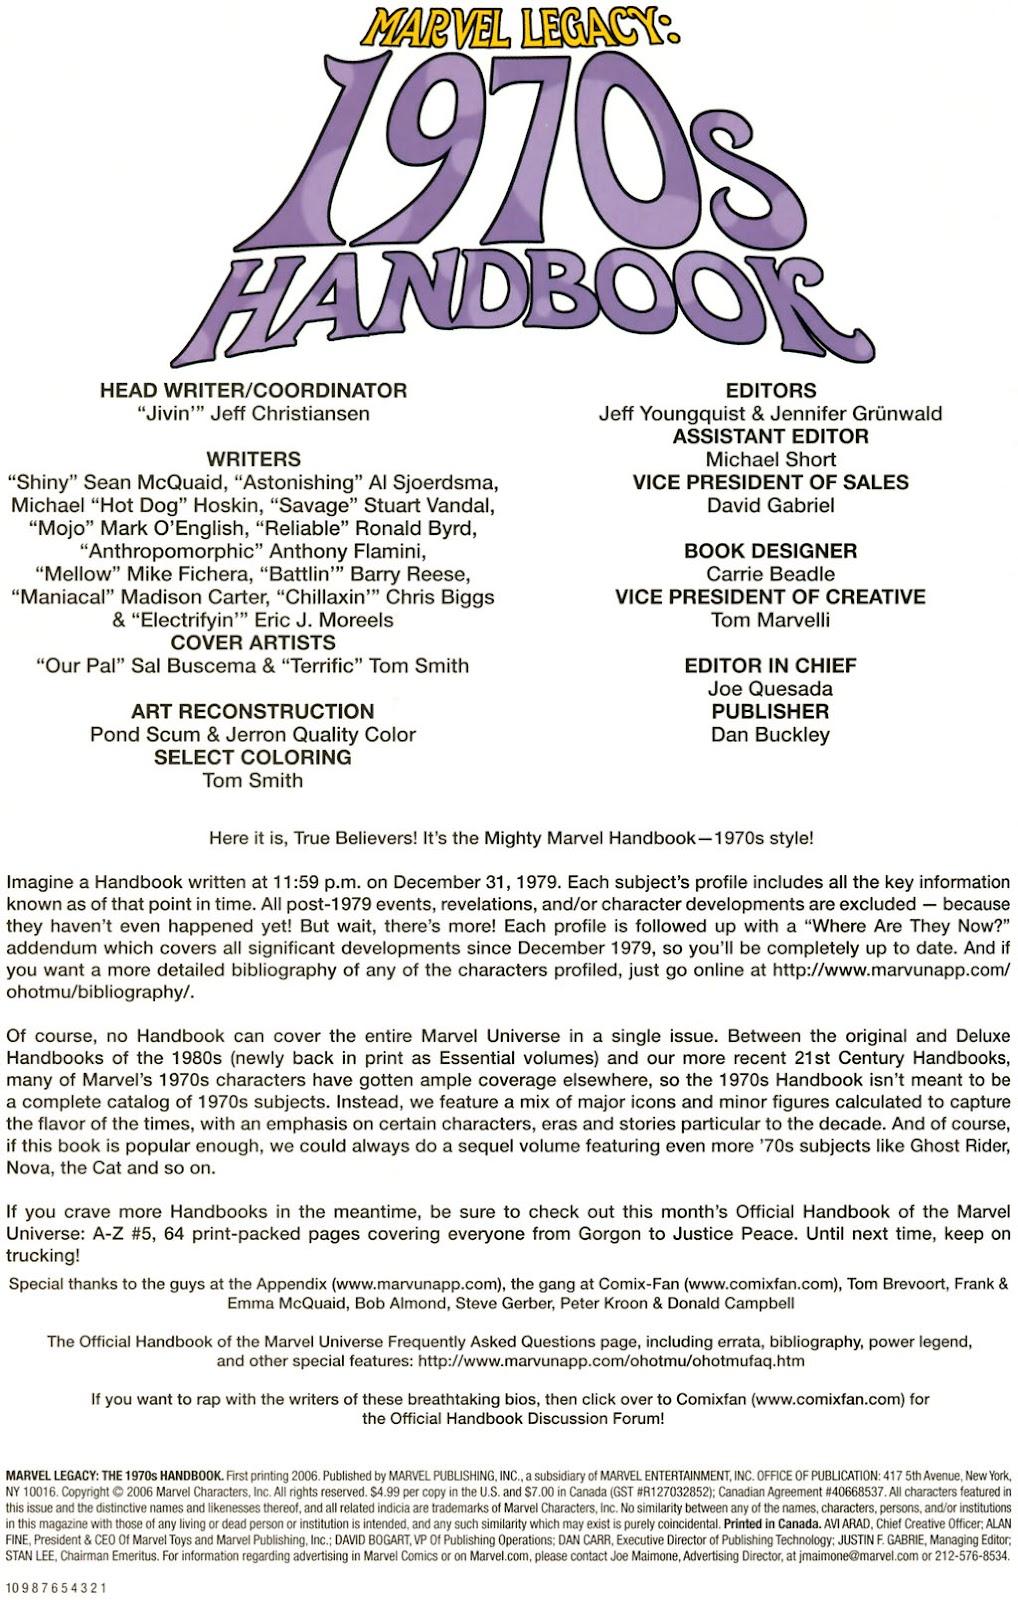 Read online Marvel Legacy: The 1970's Handbook comic -  Issue # Full - 2